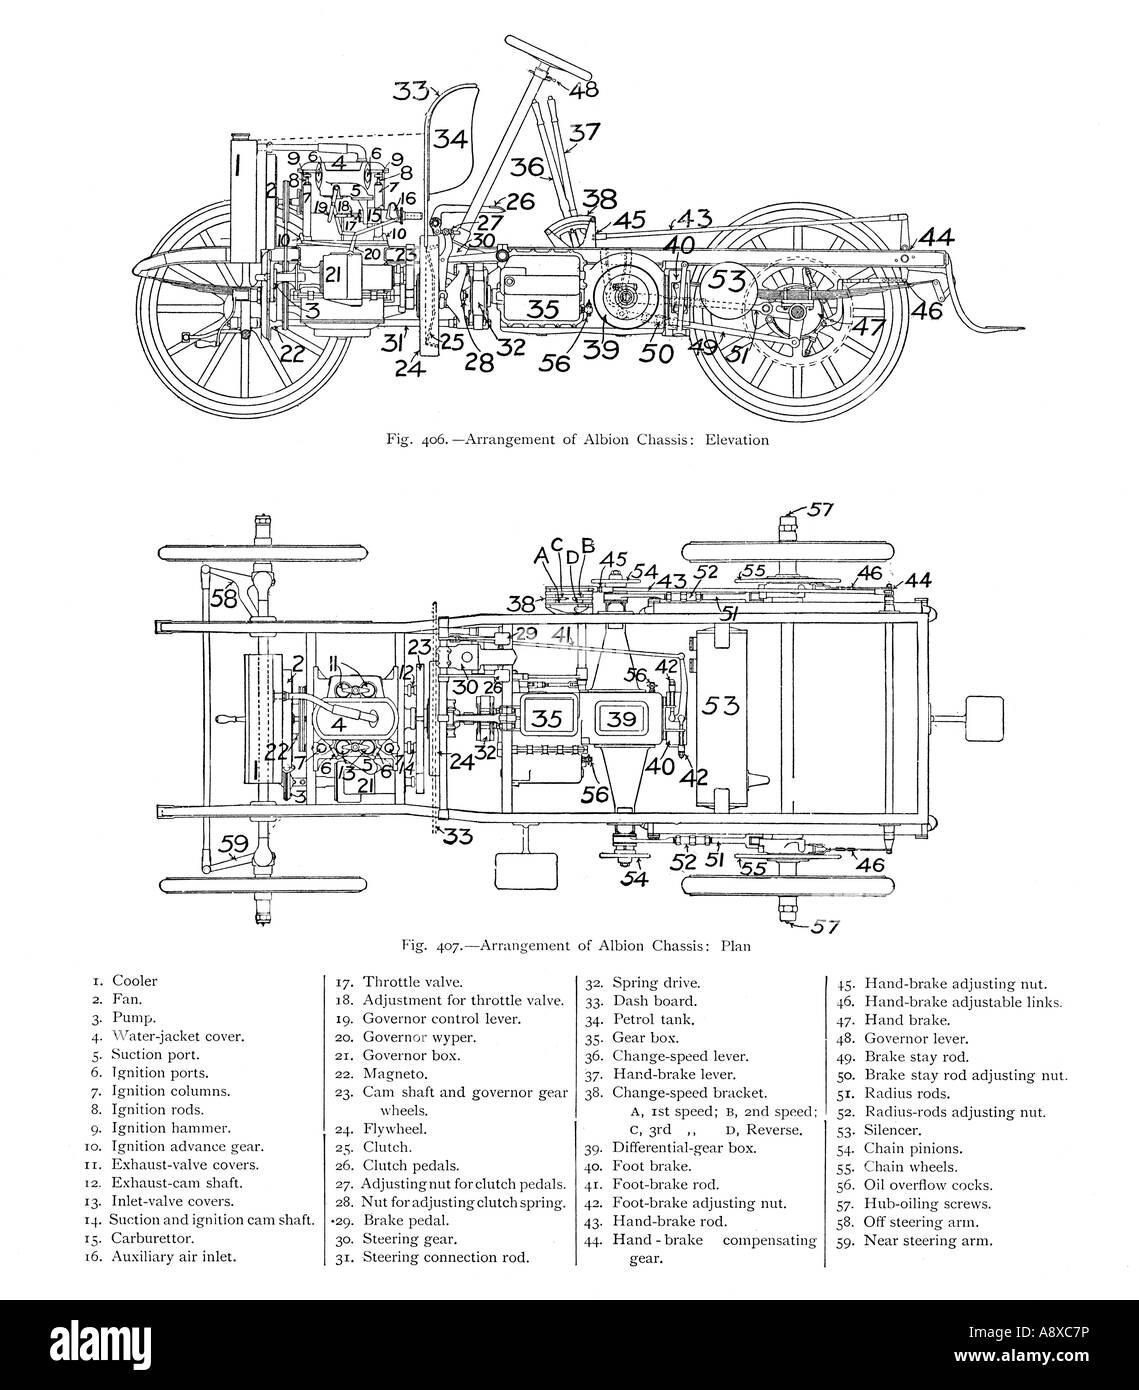 Tolle Diagramm Des Automotors Fotos - Elektrische Schaltplan-Ideen ...